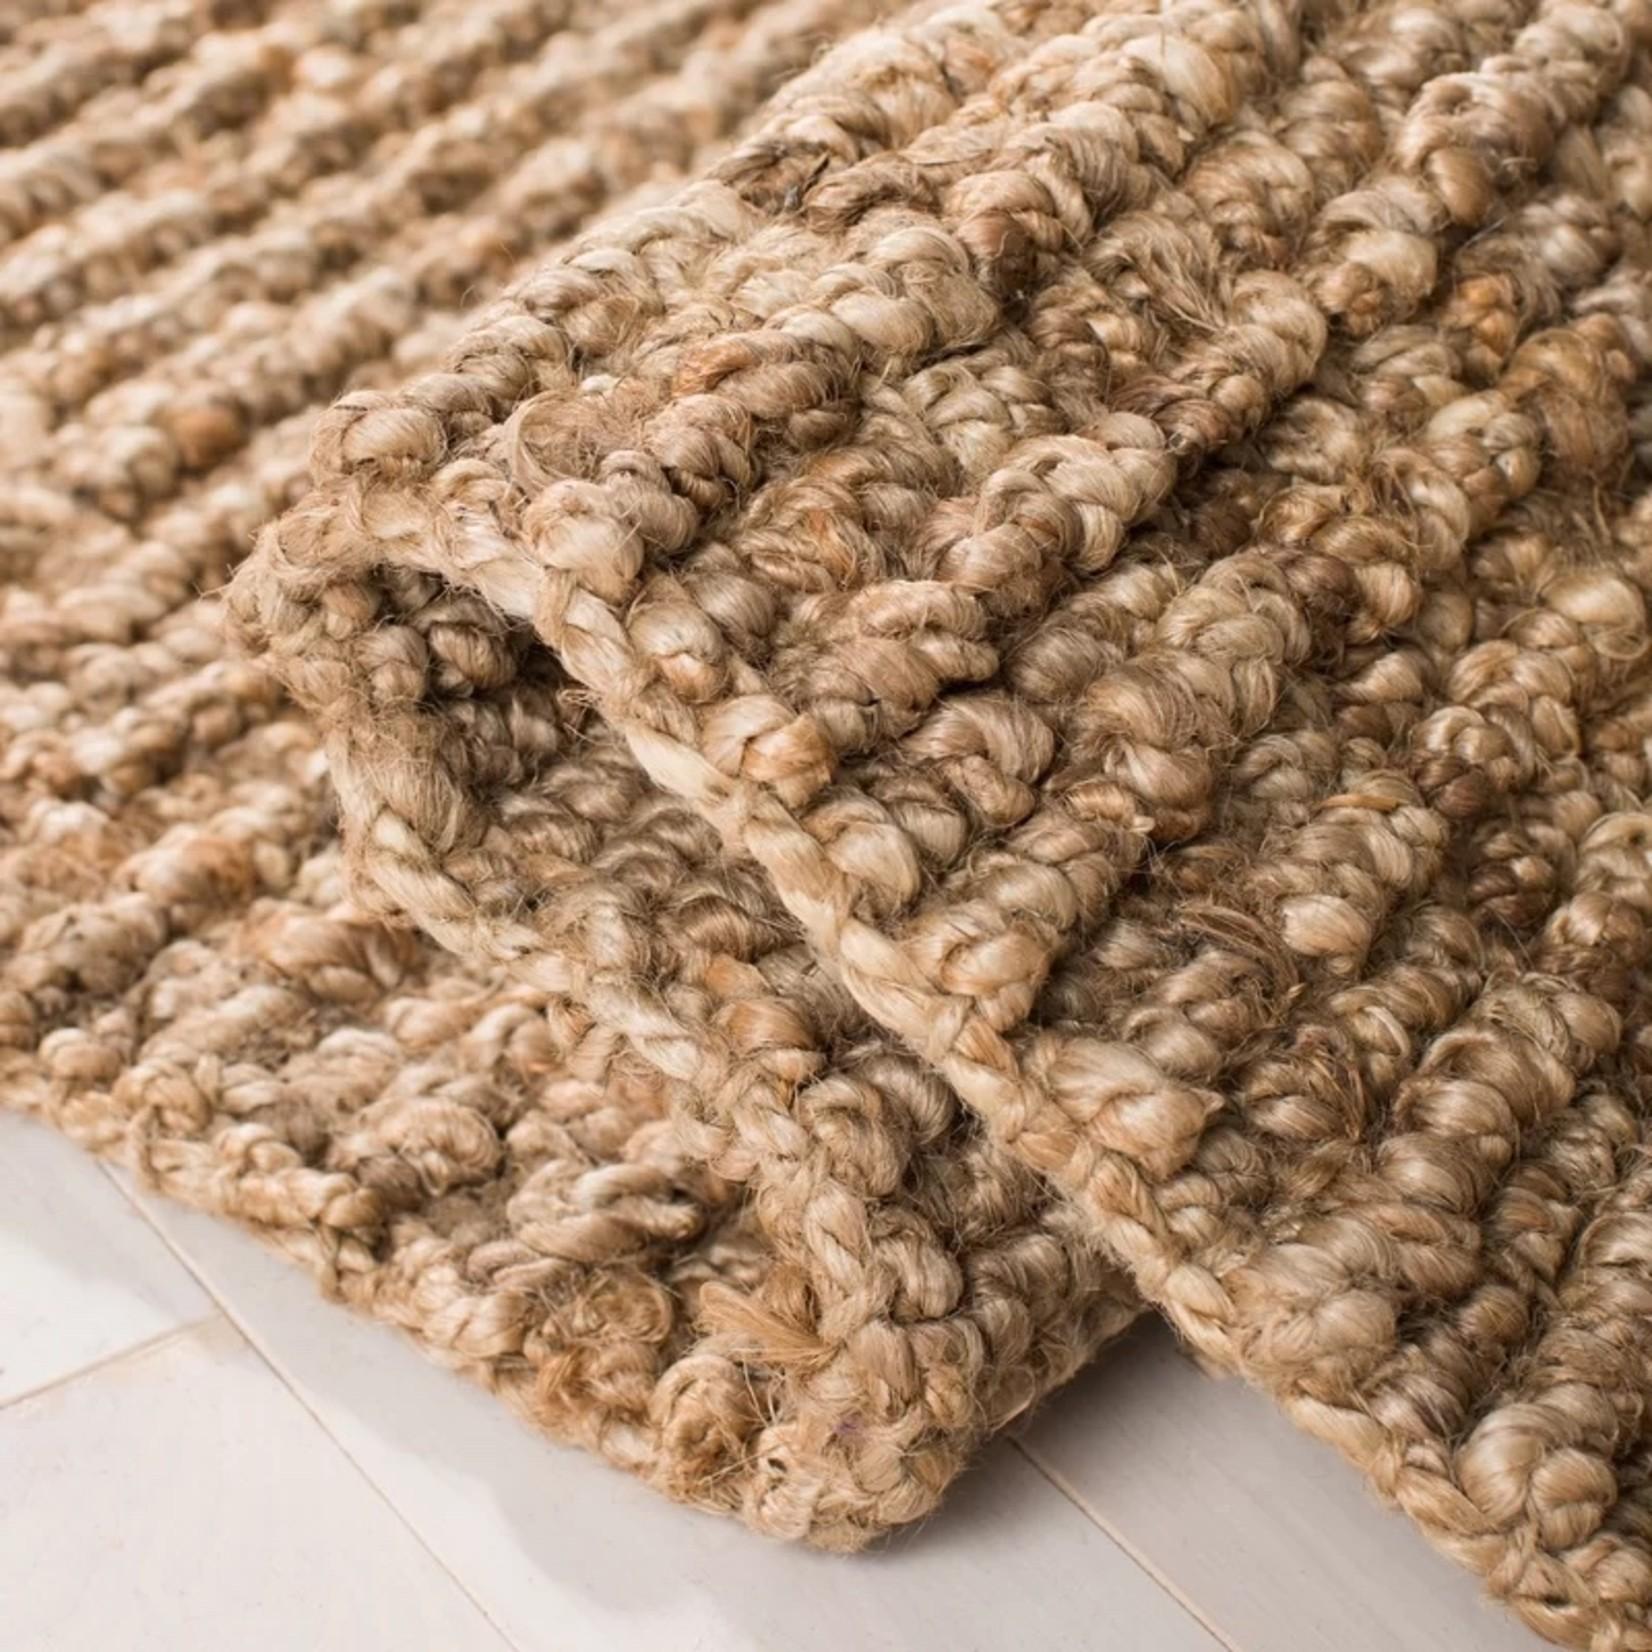 *2' x 4' - Grassmere Handmade Jute Natural Area Rug